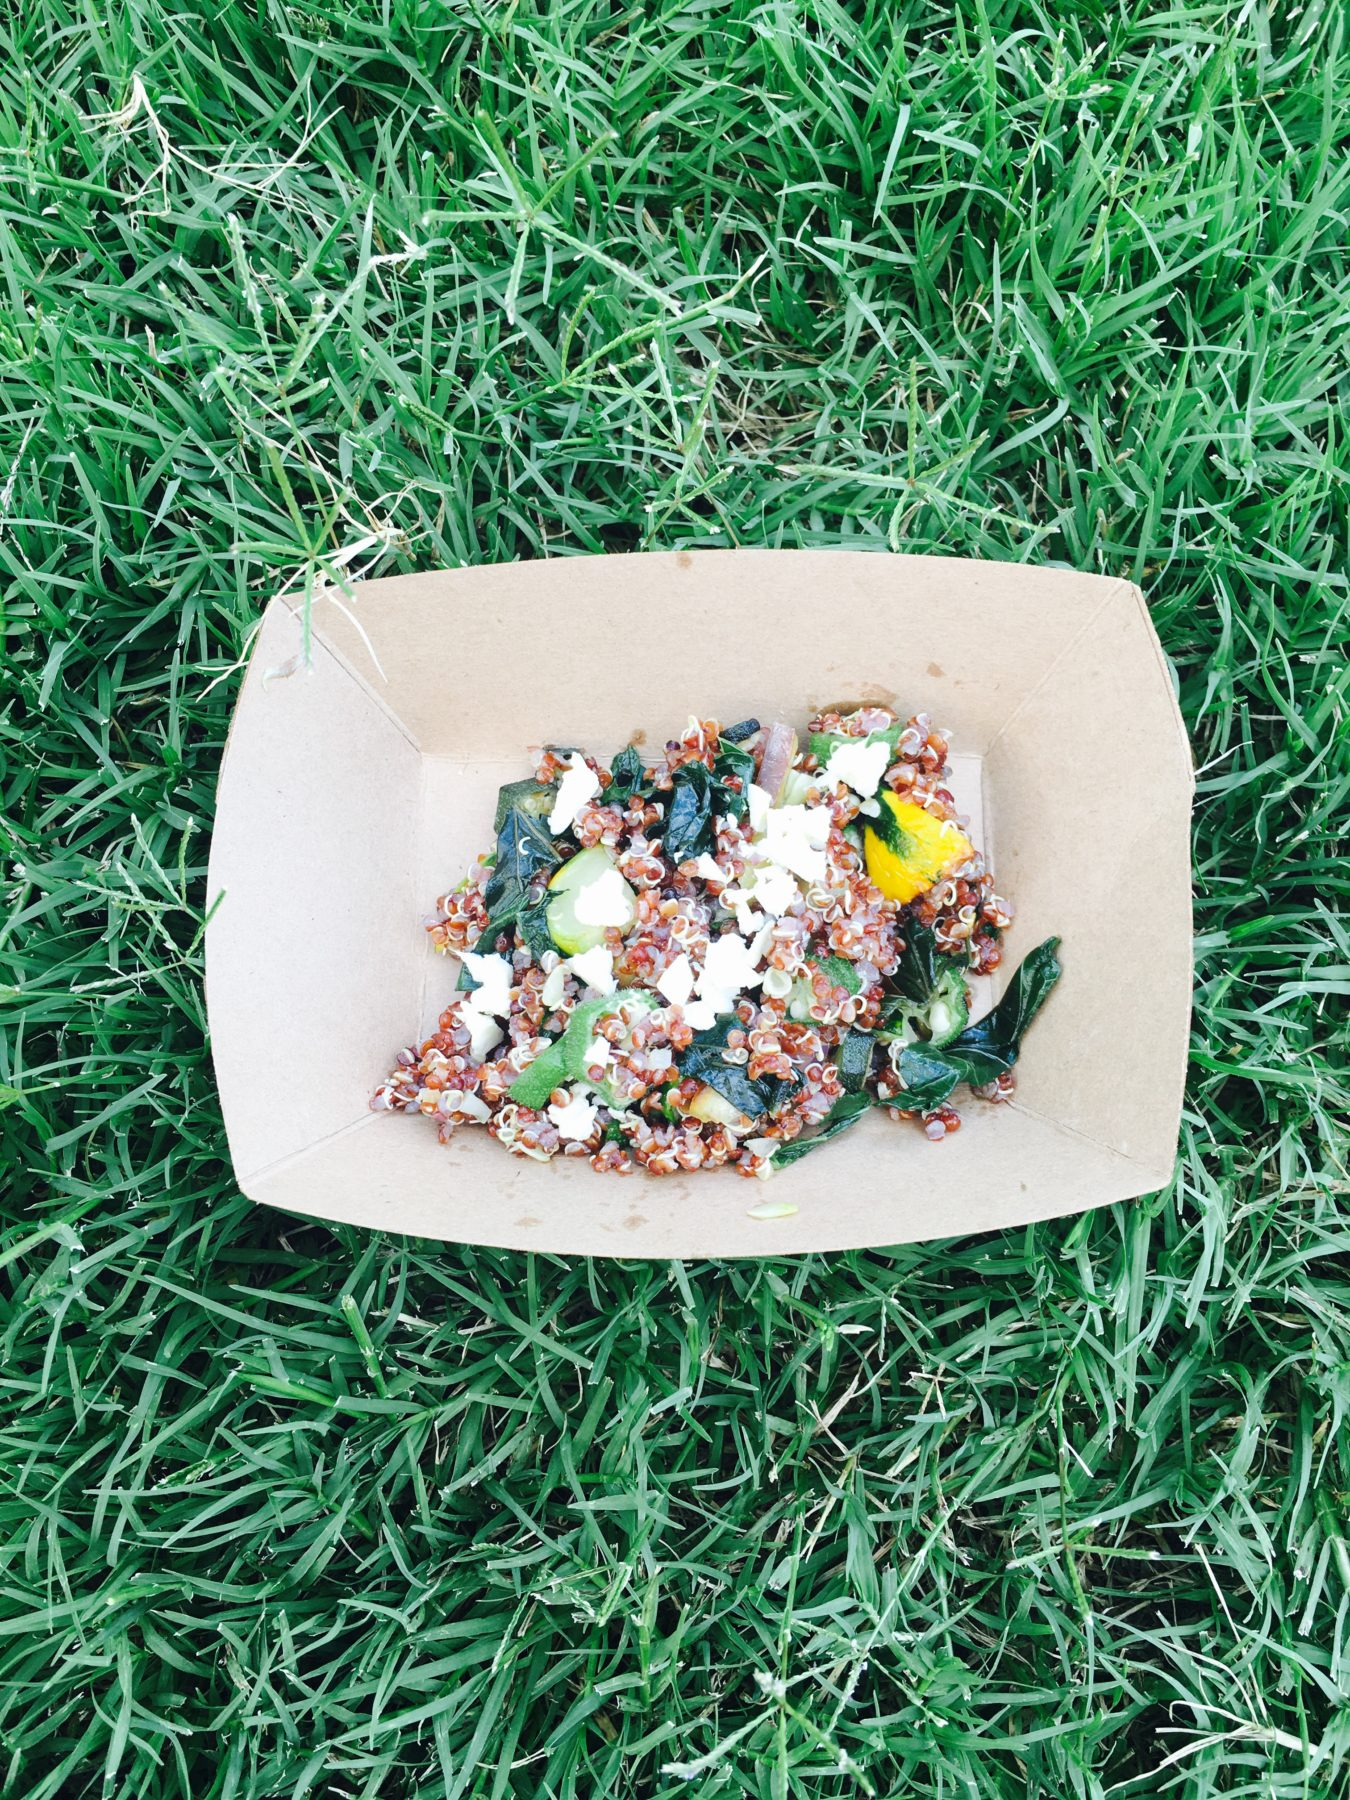 2016-08-17-paola-villafane-market-quinoa-salad-sample